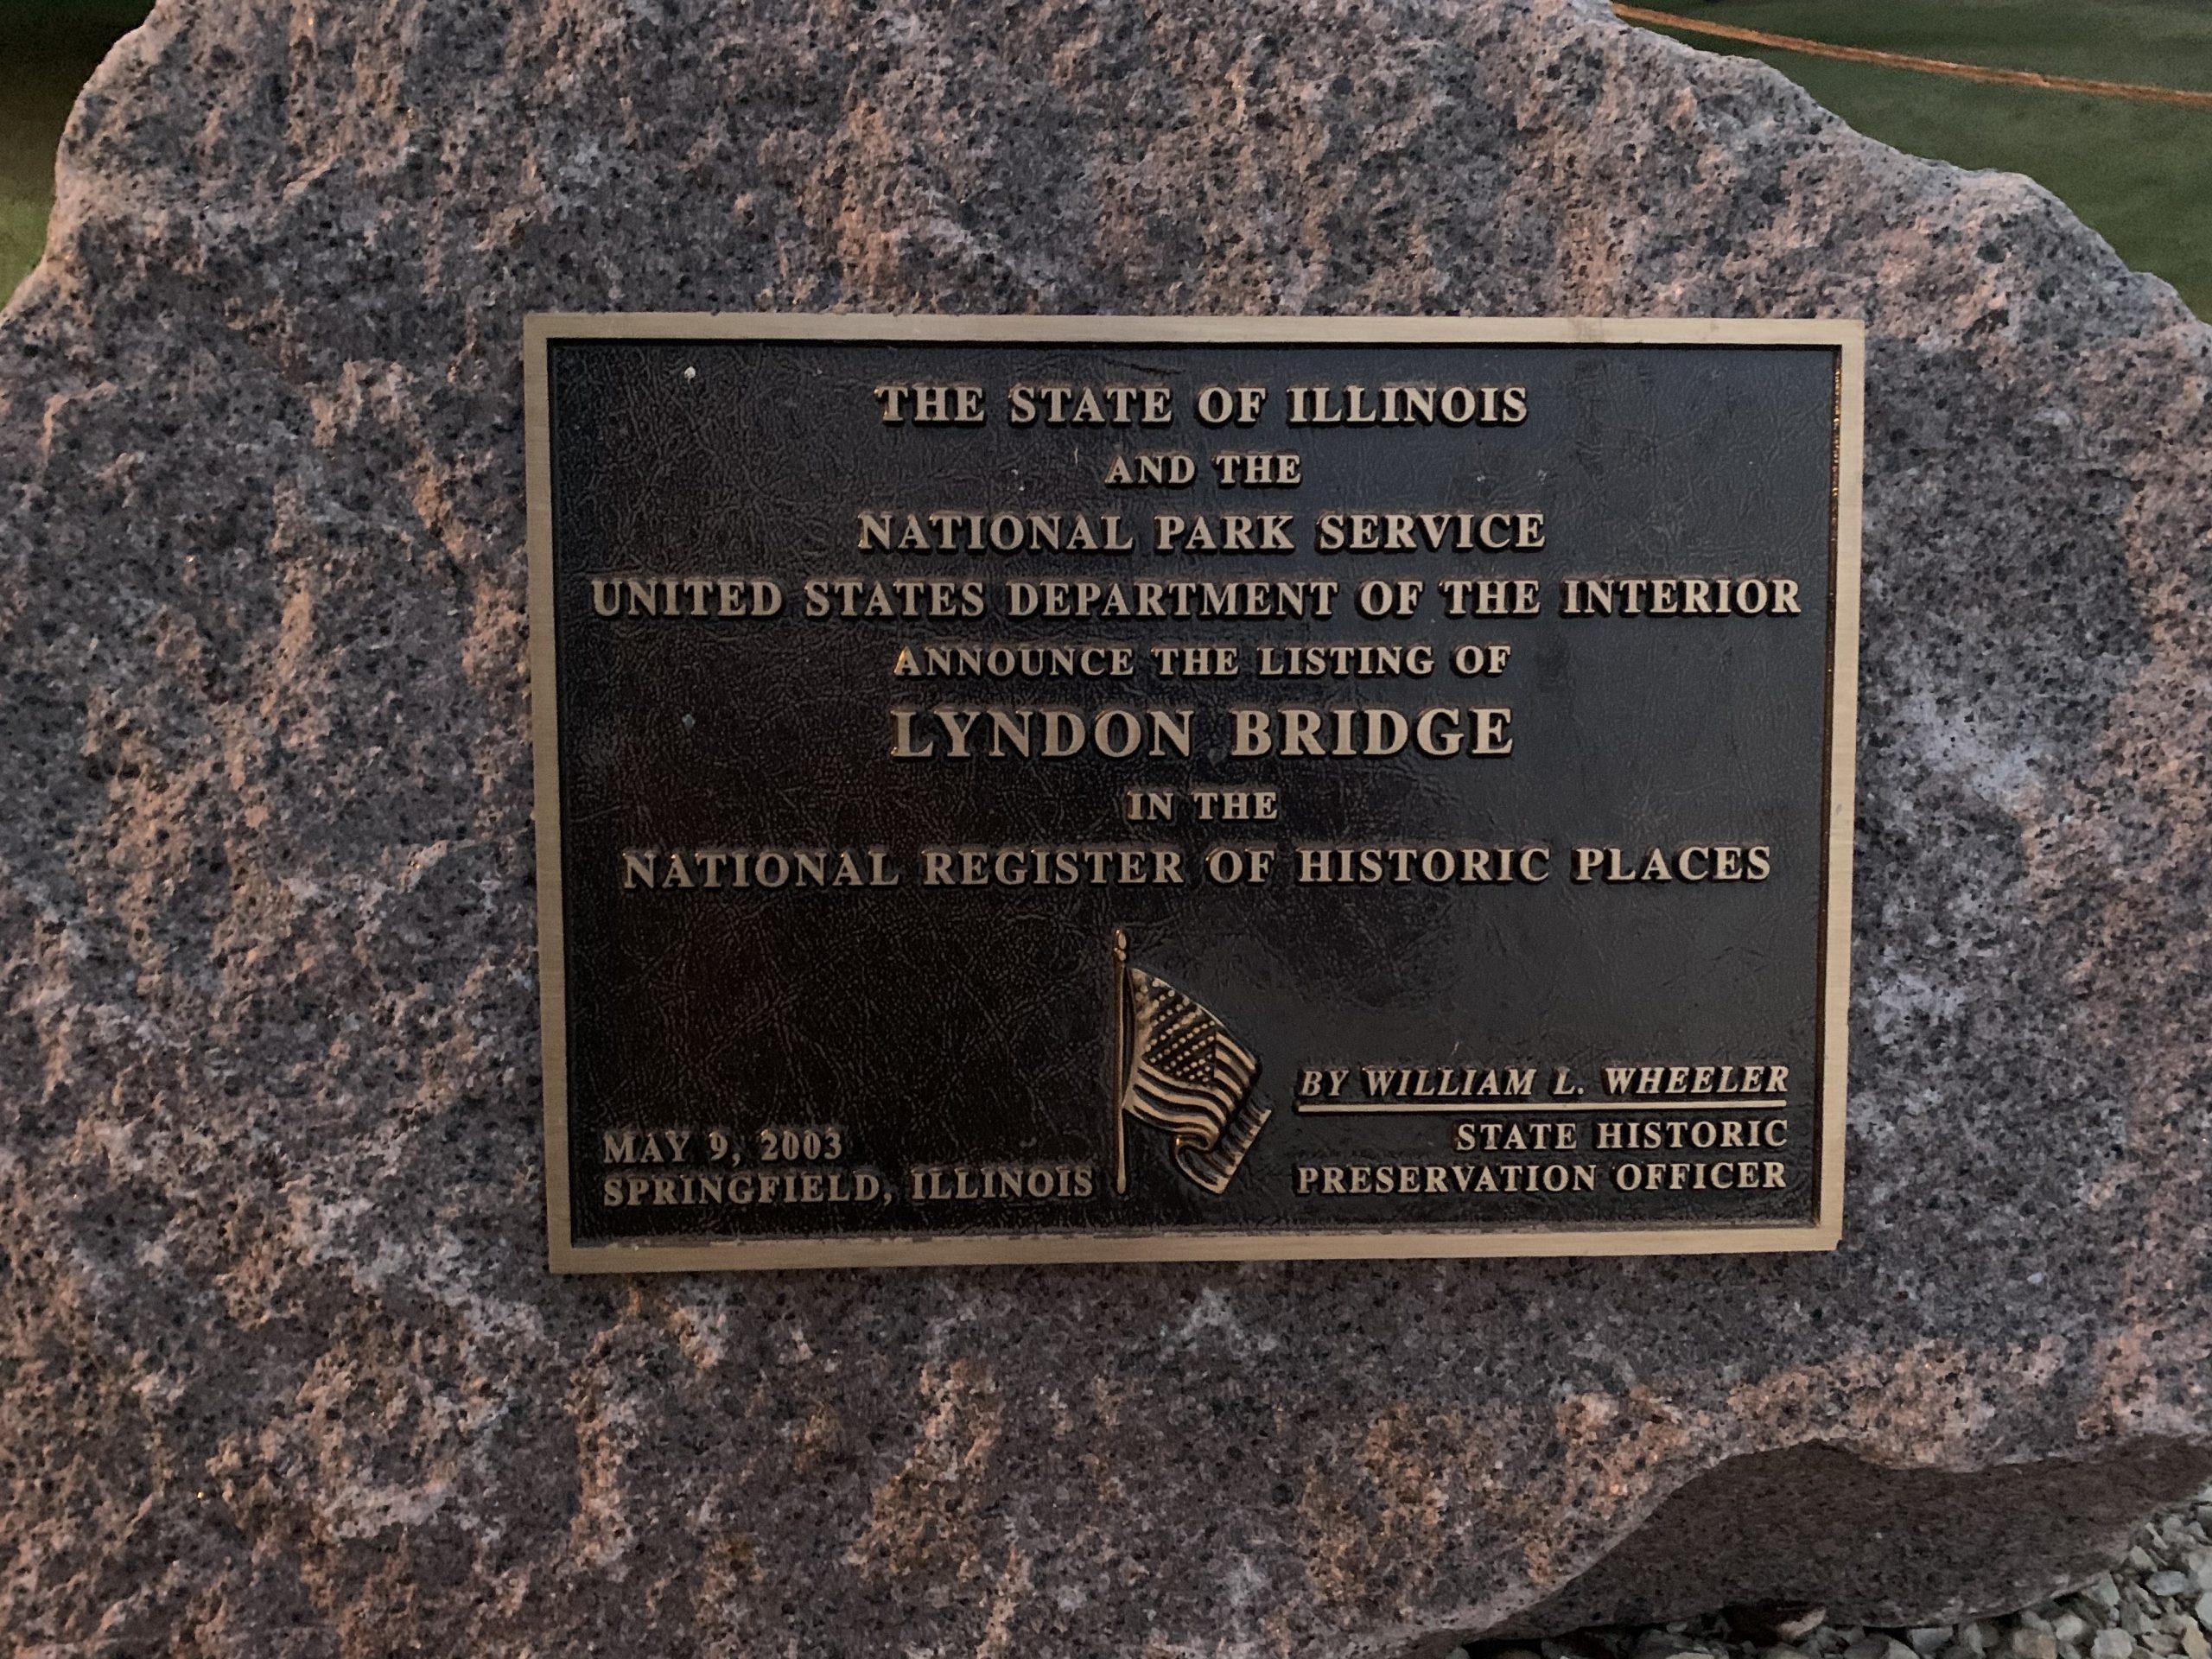 Lyndon Bridge, Historical Places